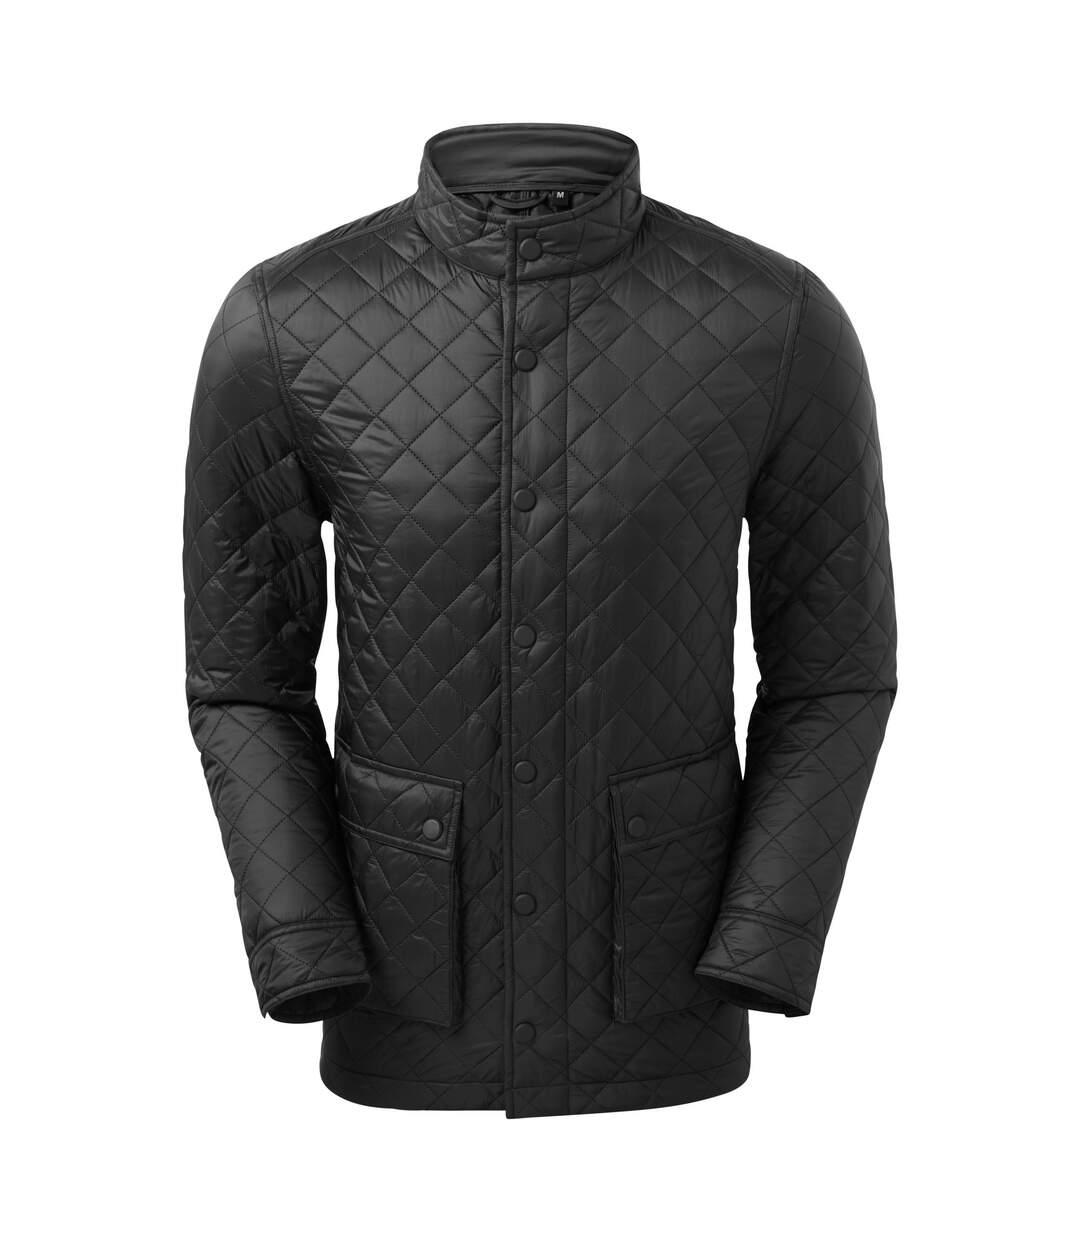 2786 Mens Quartic Quilt Jacket (Black) - UTRW7386